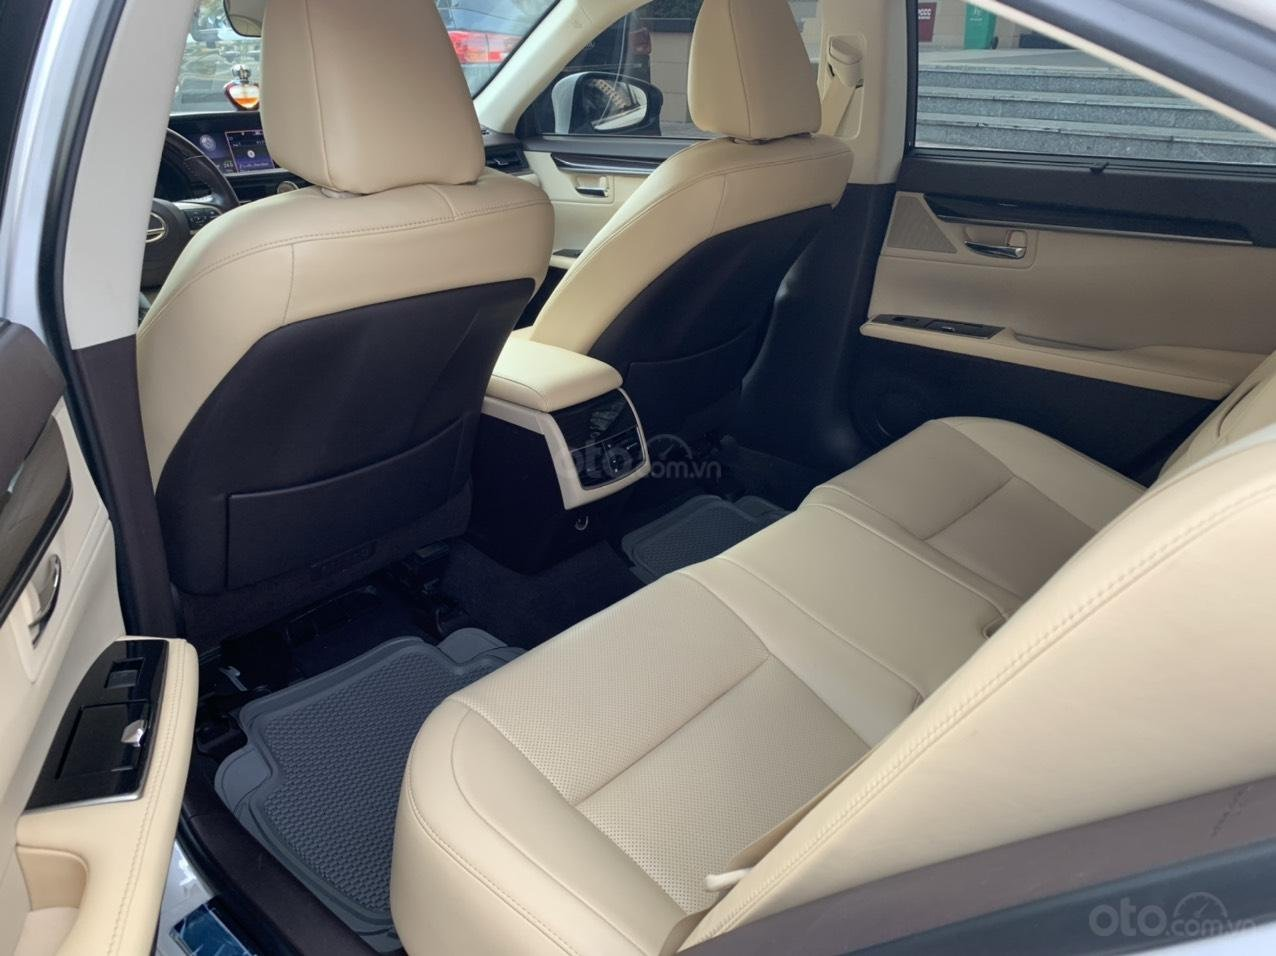 Bán Lexus ES 350 model 2016 giá 1 tỷ 790 tại HCM (8)